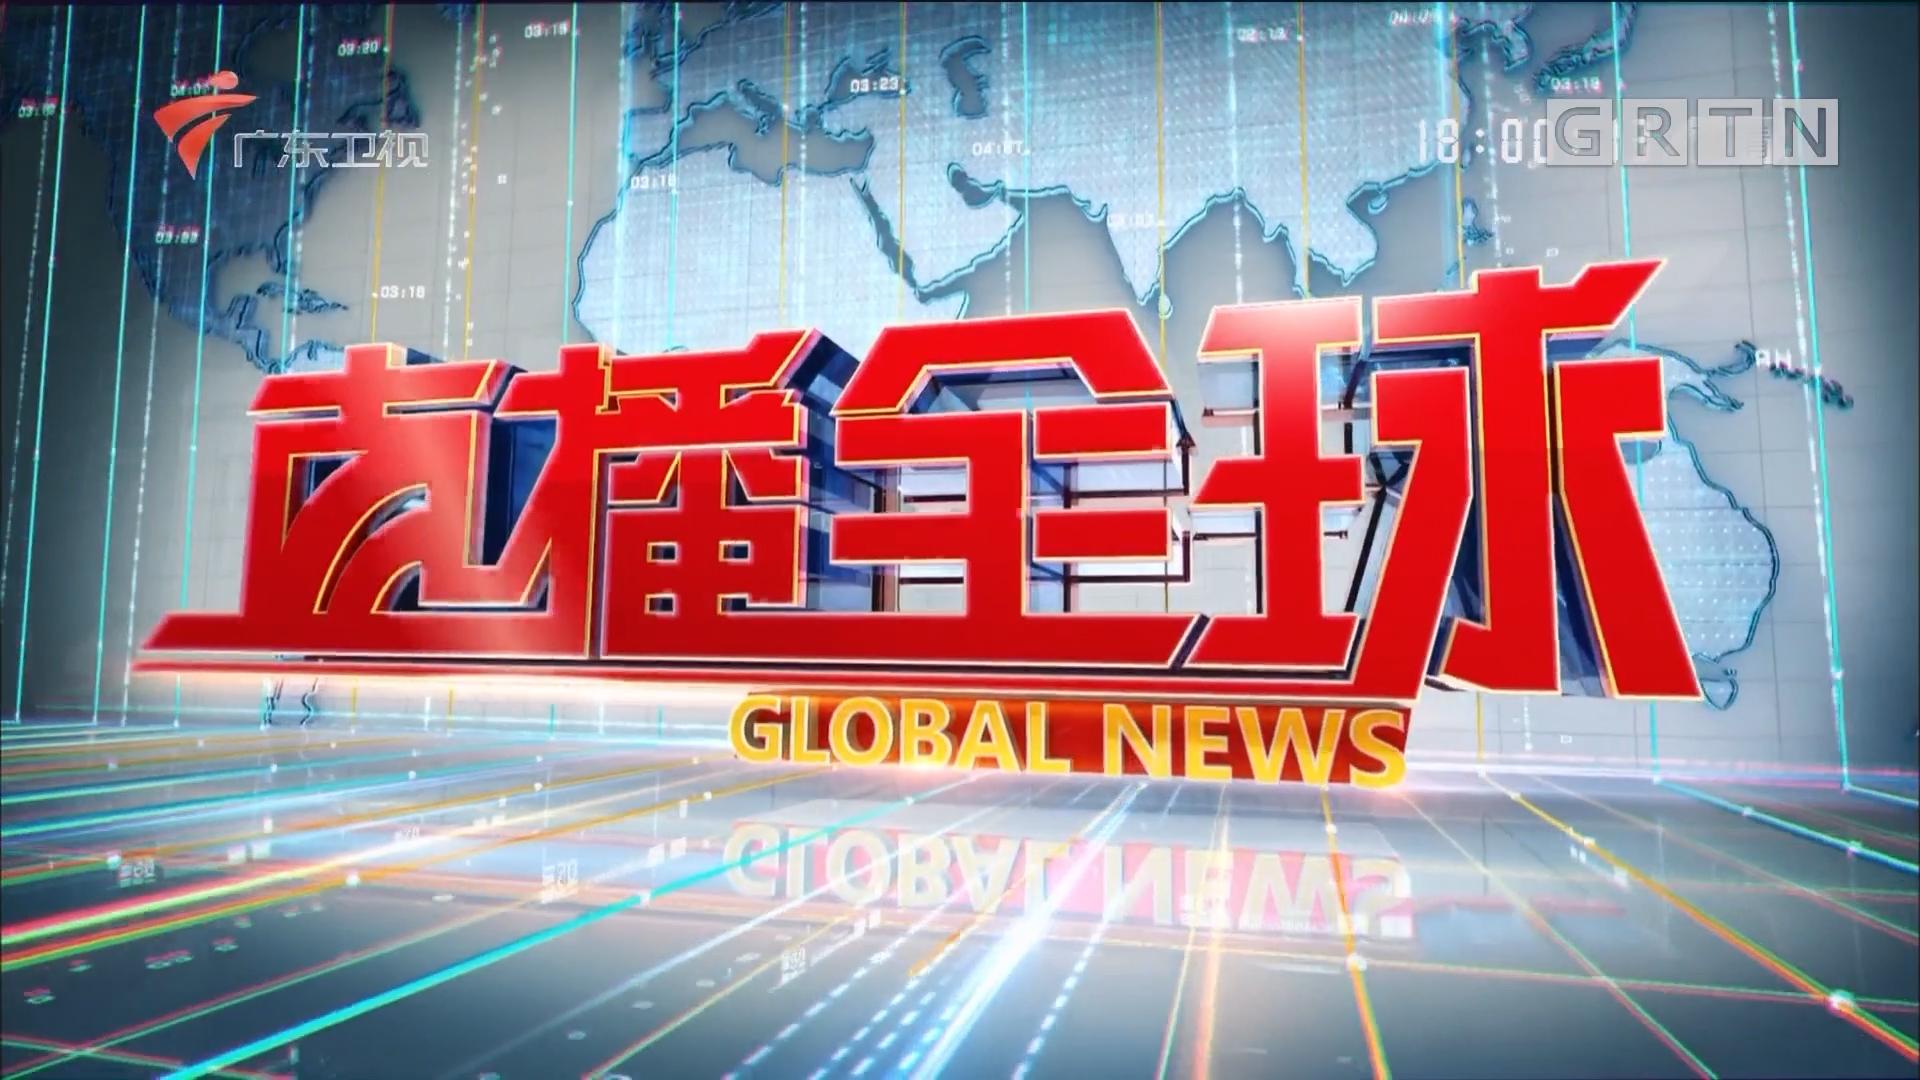 [HD][2017-12-14]直播全球:文在寅开启四天三夜访华行程:两位领导人举行第三次会晤